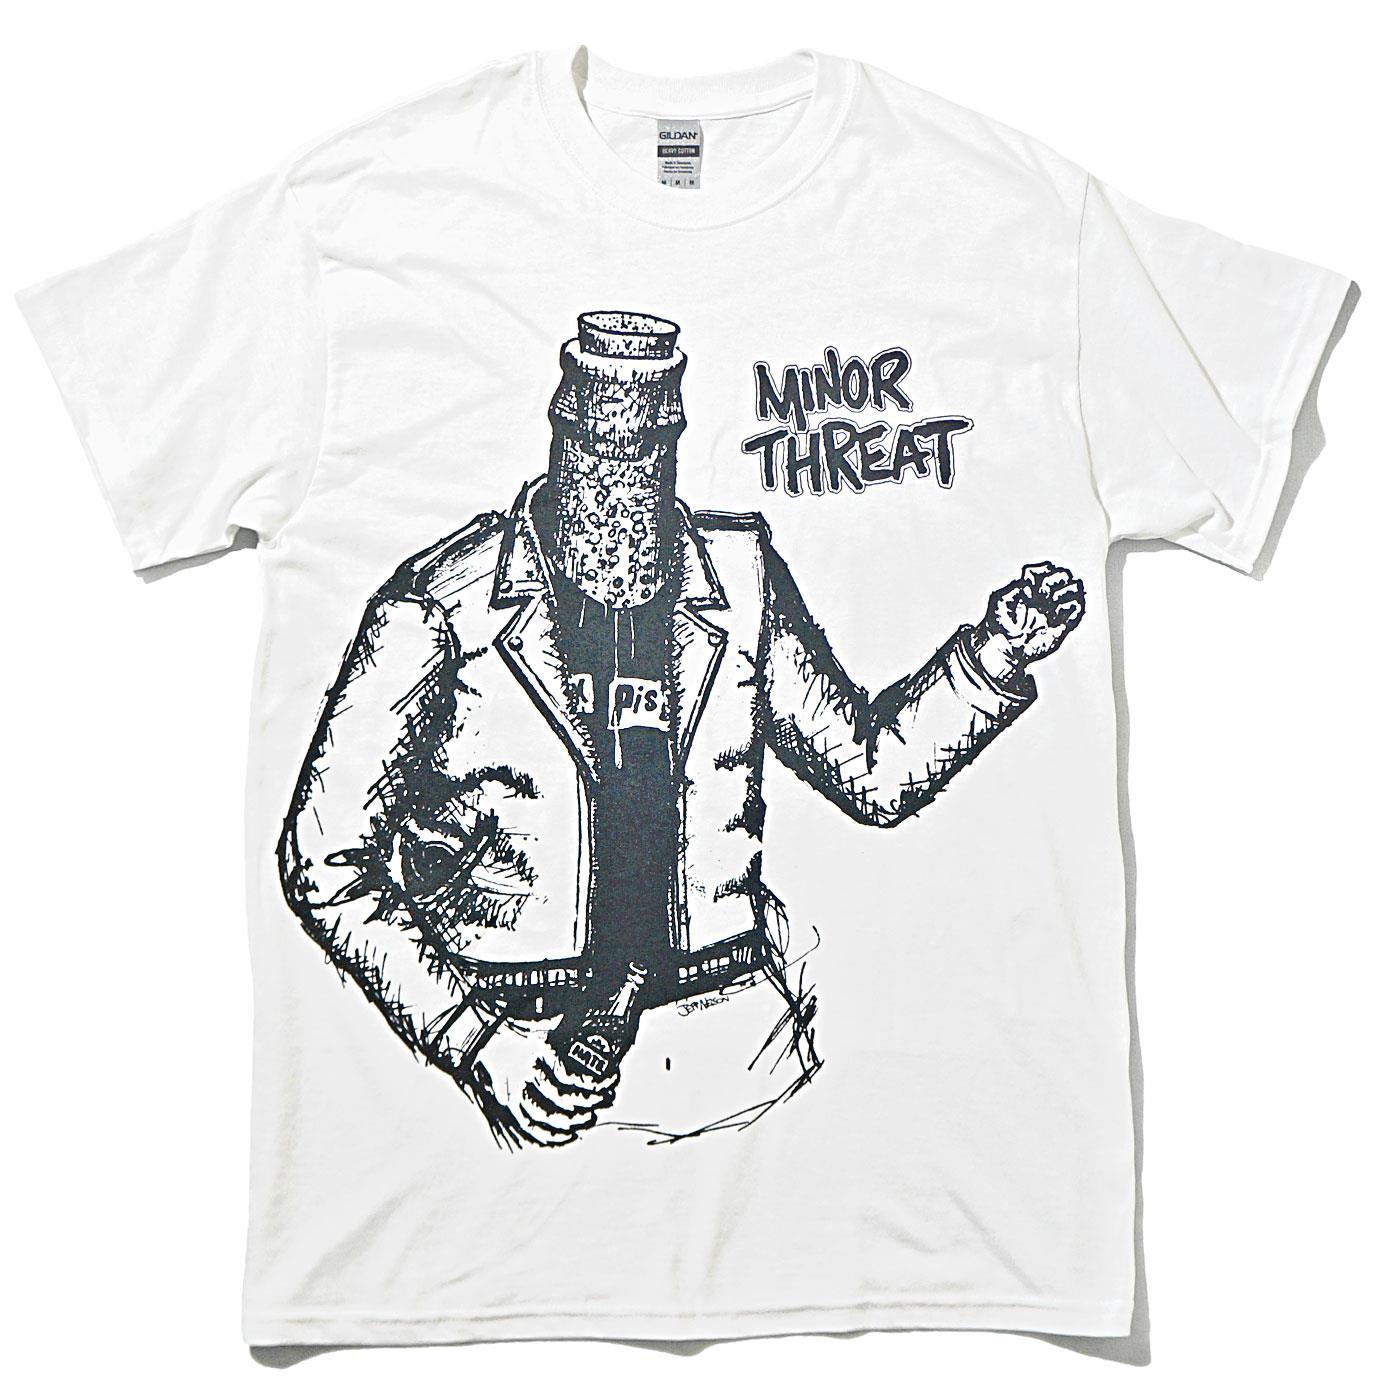 MINOR THREAT Tシャツ Bottle Man